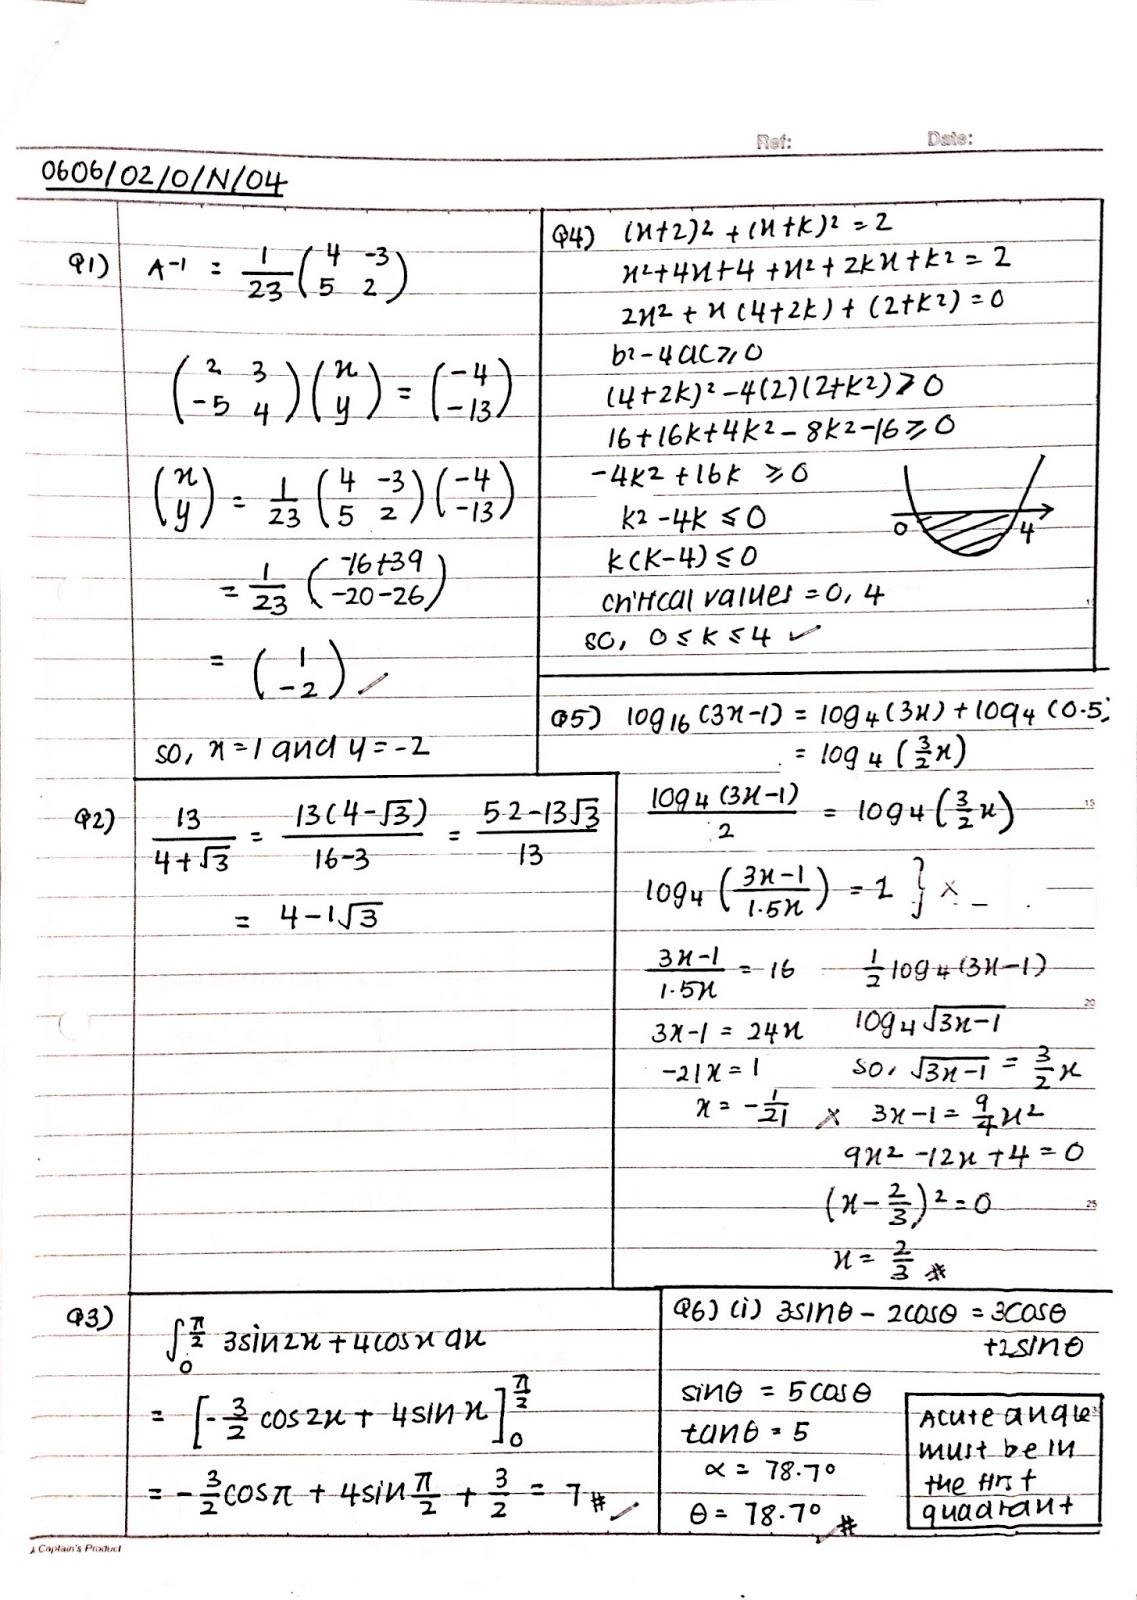 IGCSE Add Maths Working Answer [0606/02] Paper 2 2004 (Oct